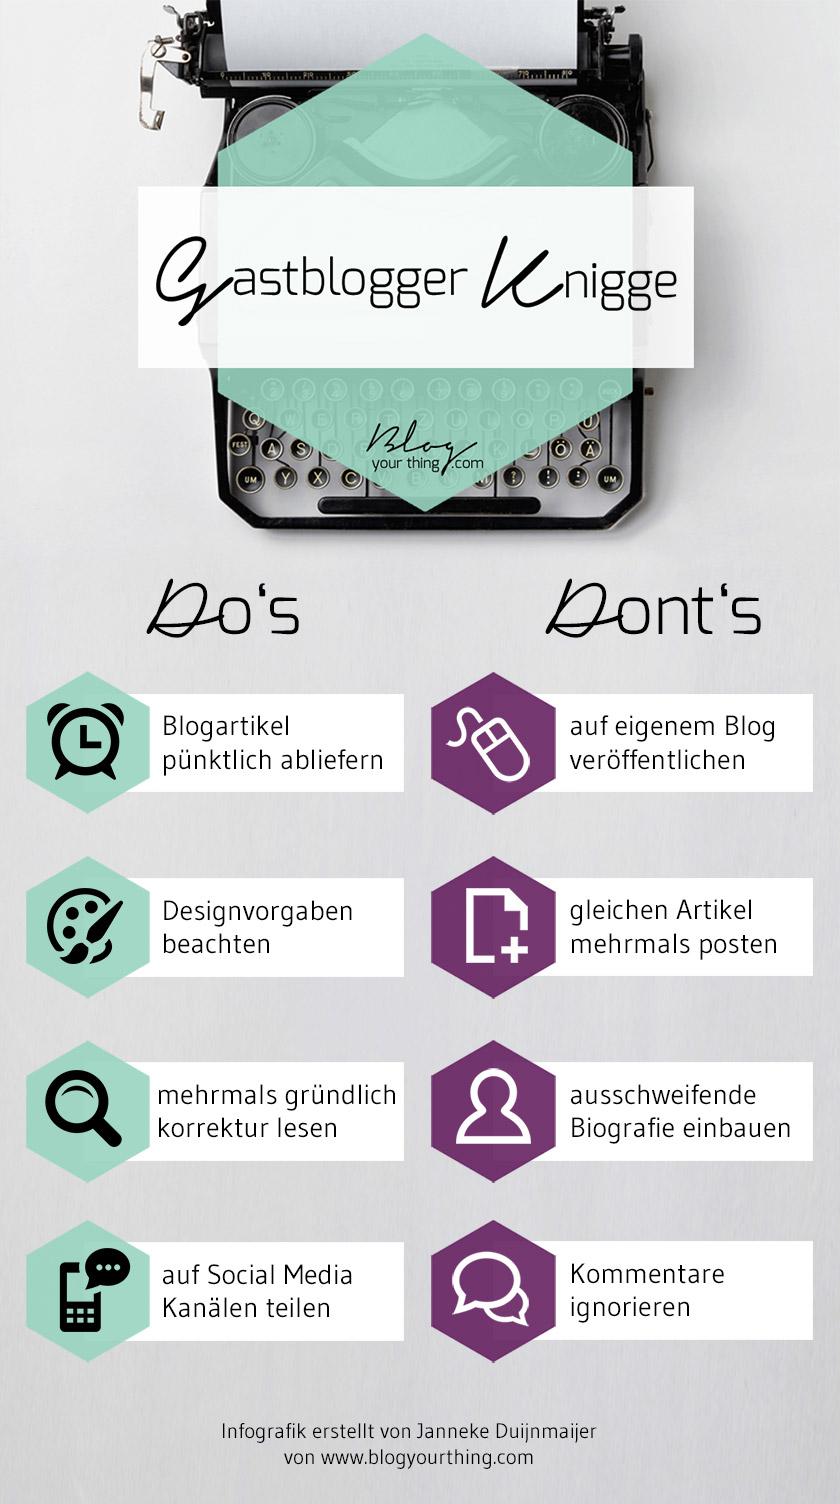 Gastblogger Knigge - Do's and Don'ts beim Gastbloggen - Infografik